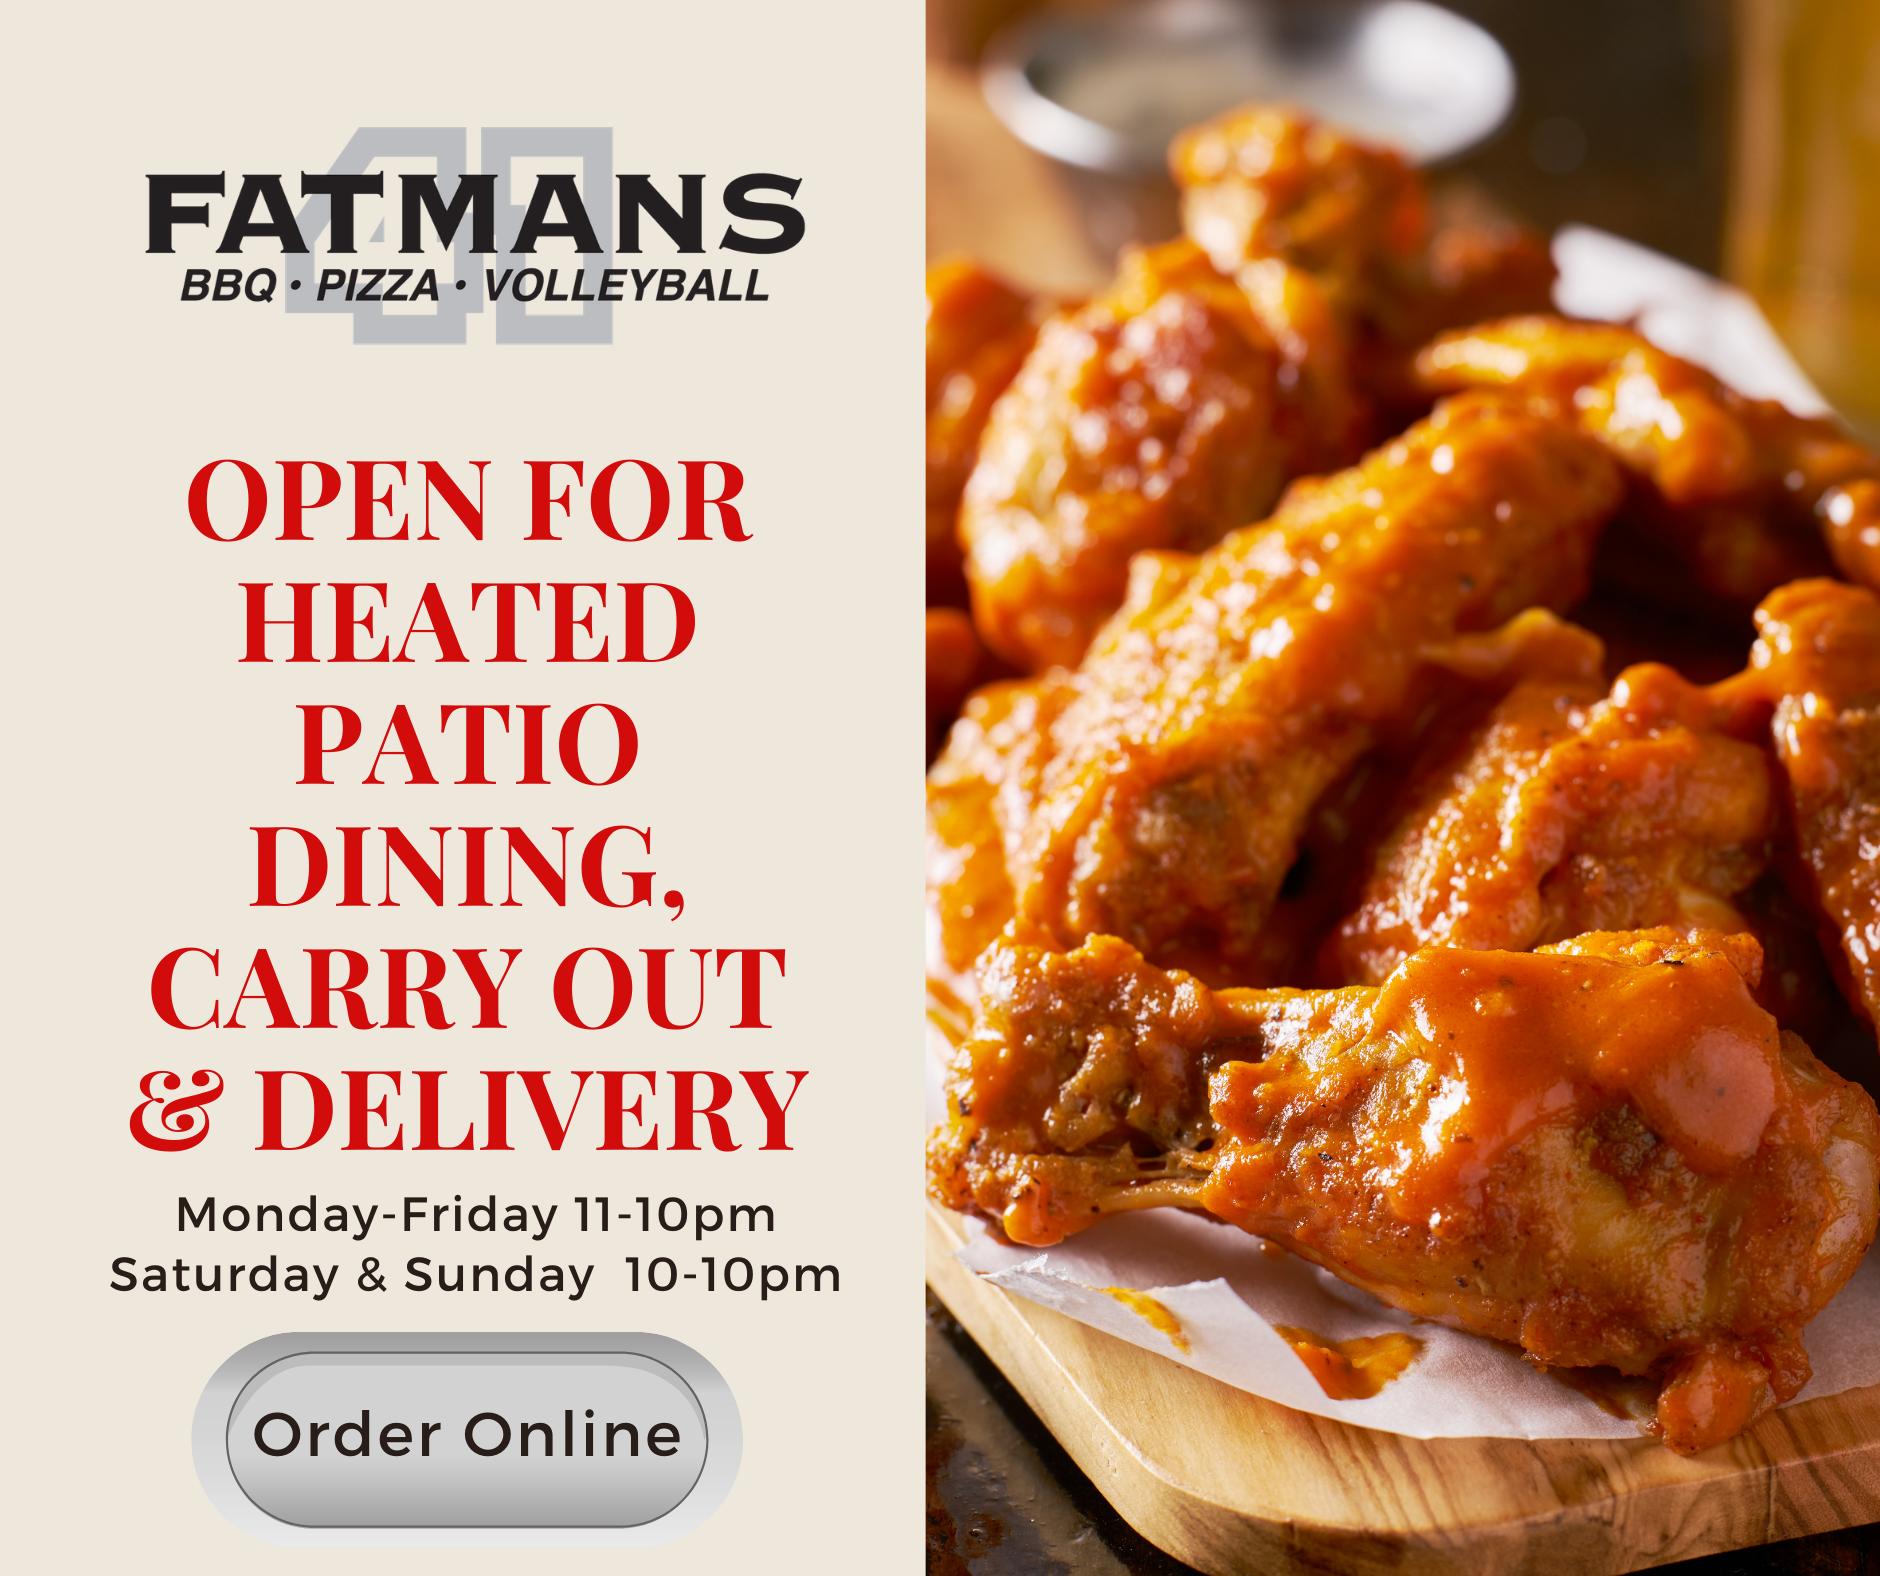 Fatmans Order Online